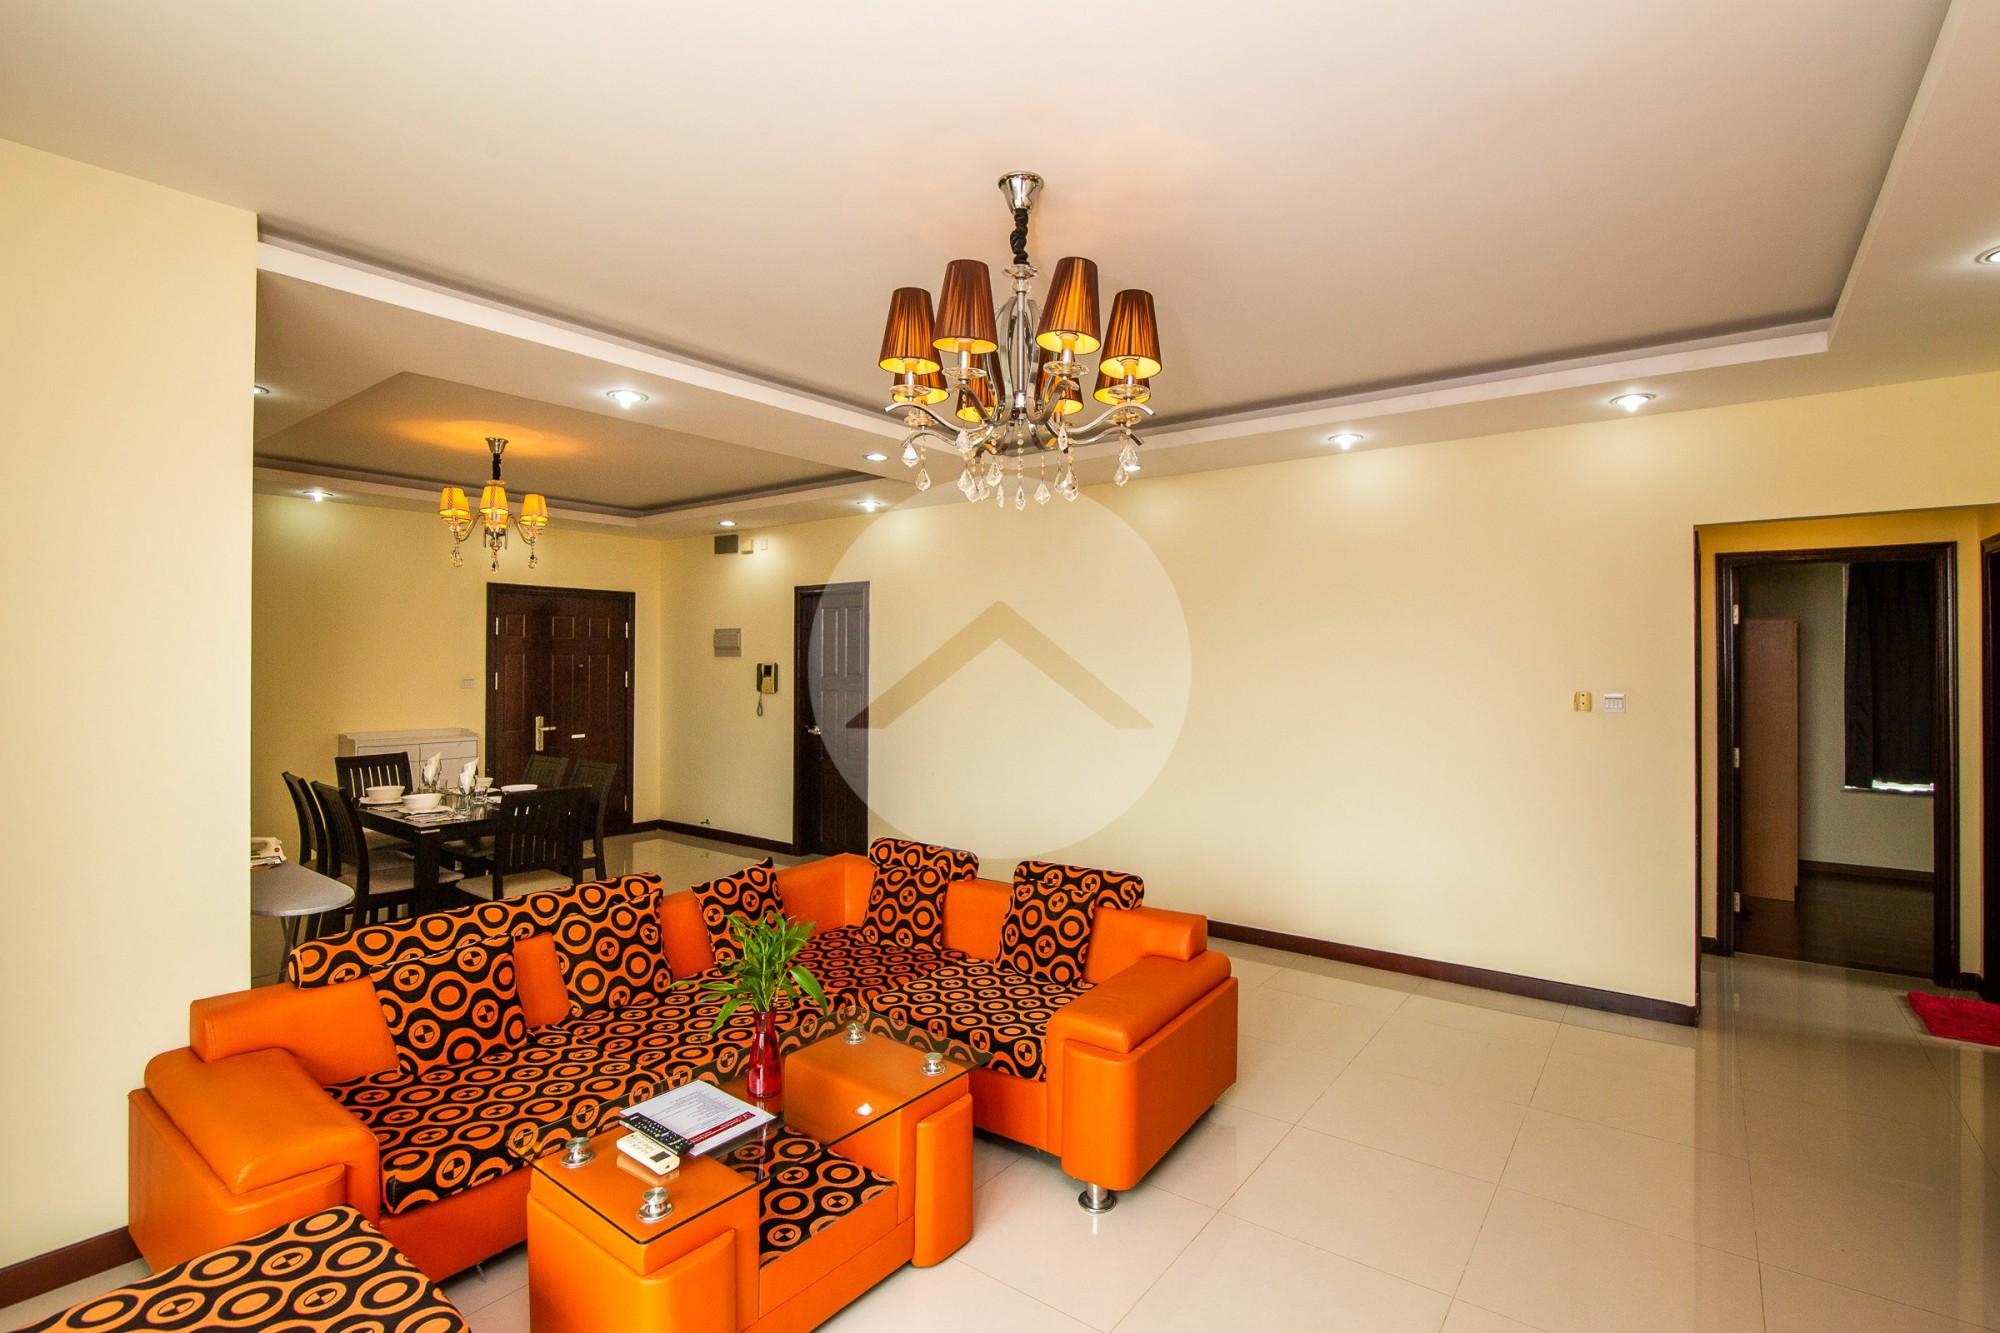 3 Bedroom Condo For Rent - Chamkarmorn, Phnom Penh